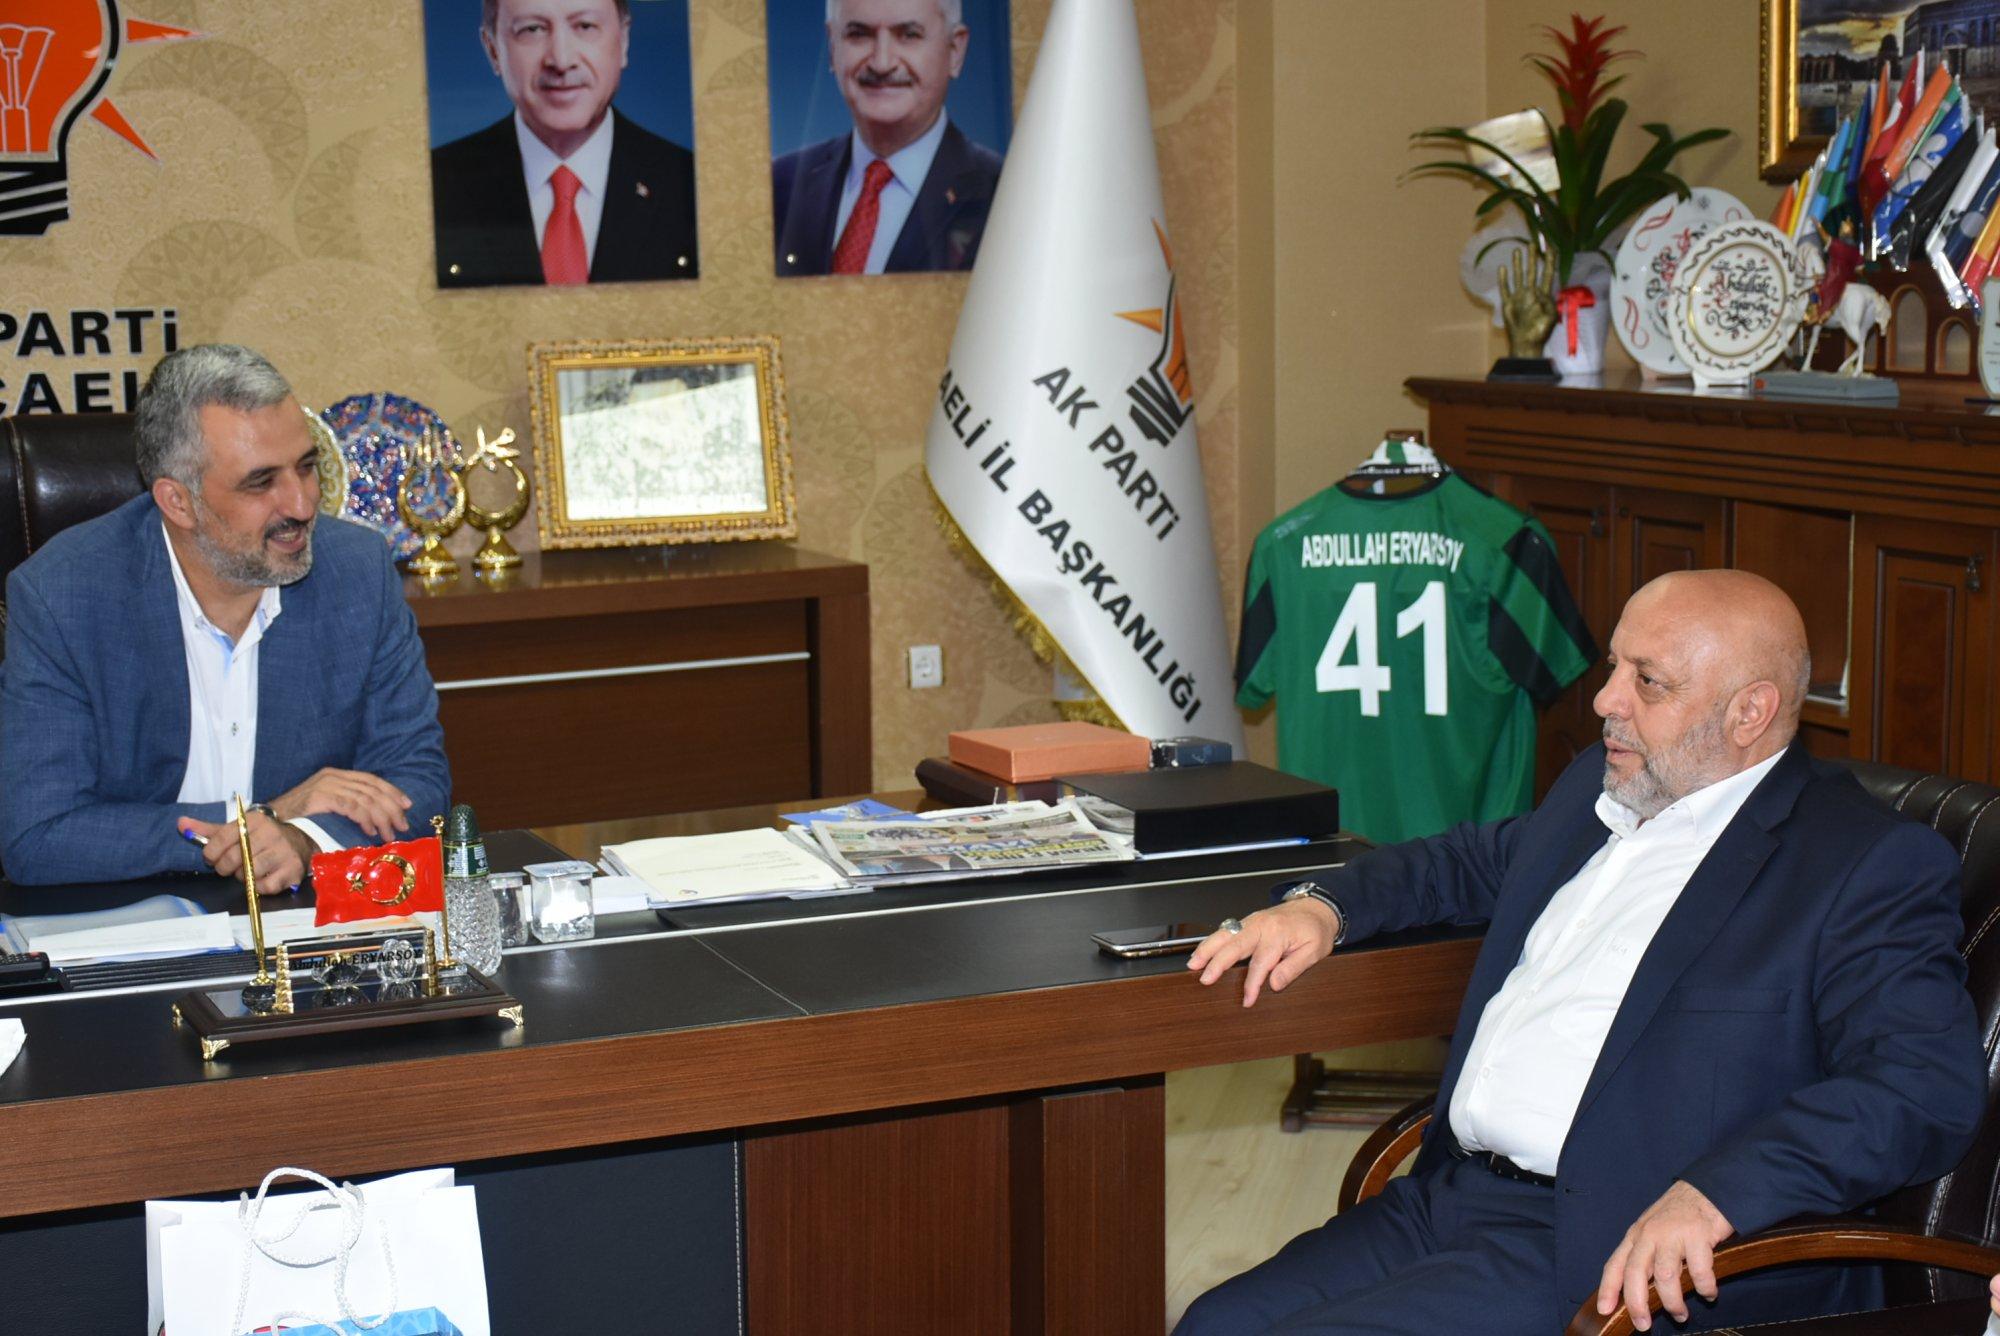 ARSLAN'DAN AK PARTİ KOCAELİ İL BAŞKANLIĞI'NA ZİYARET